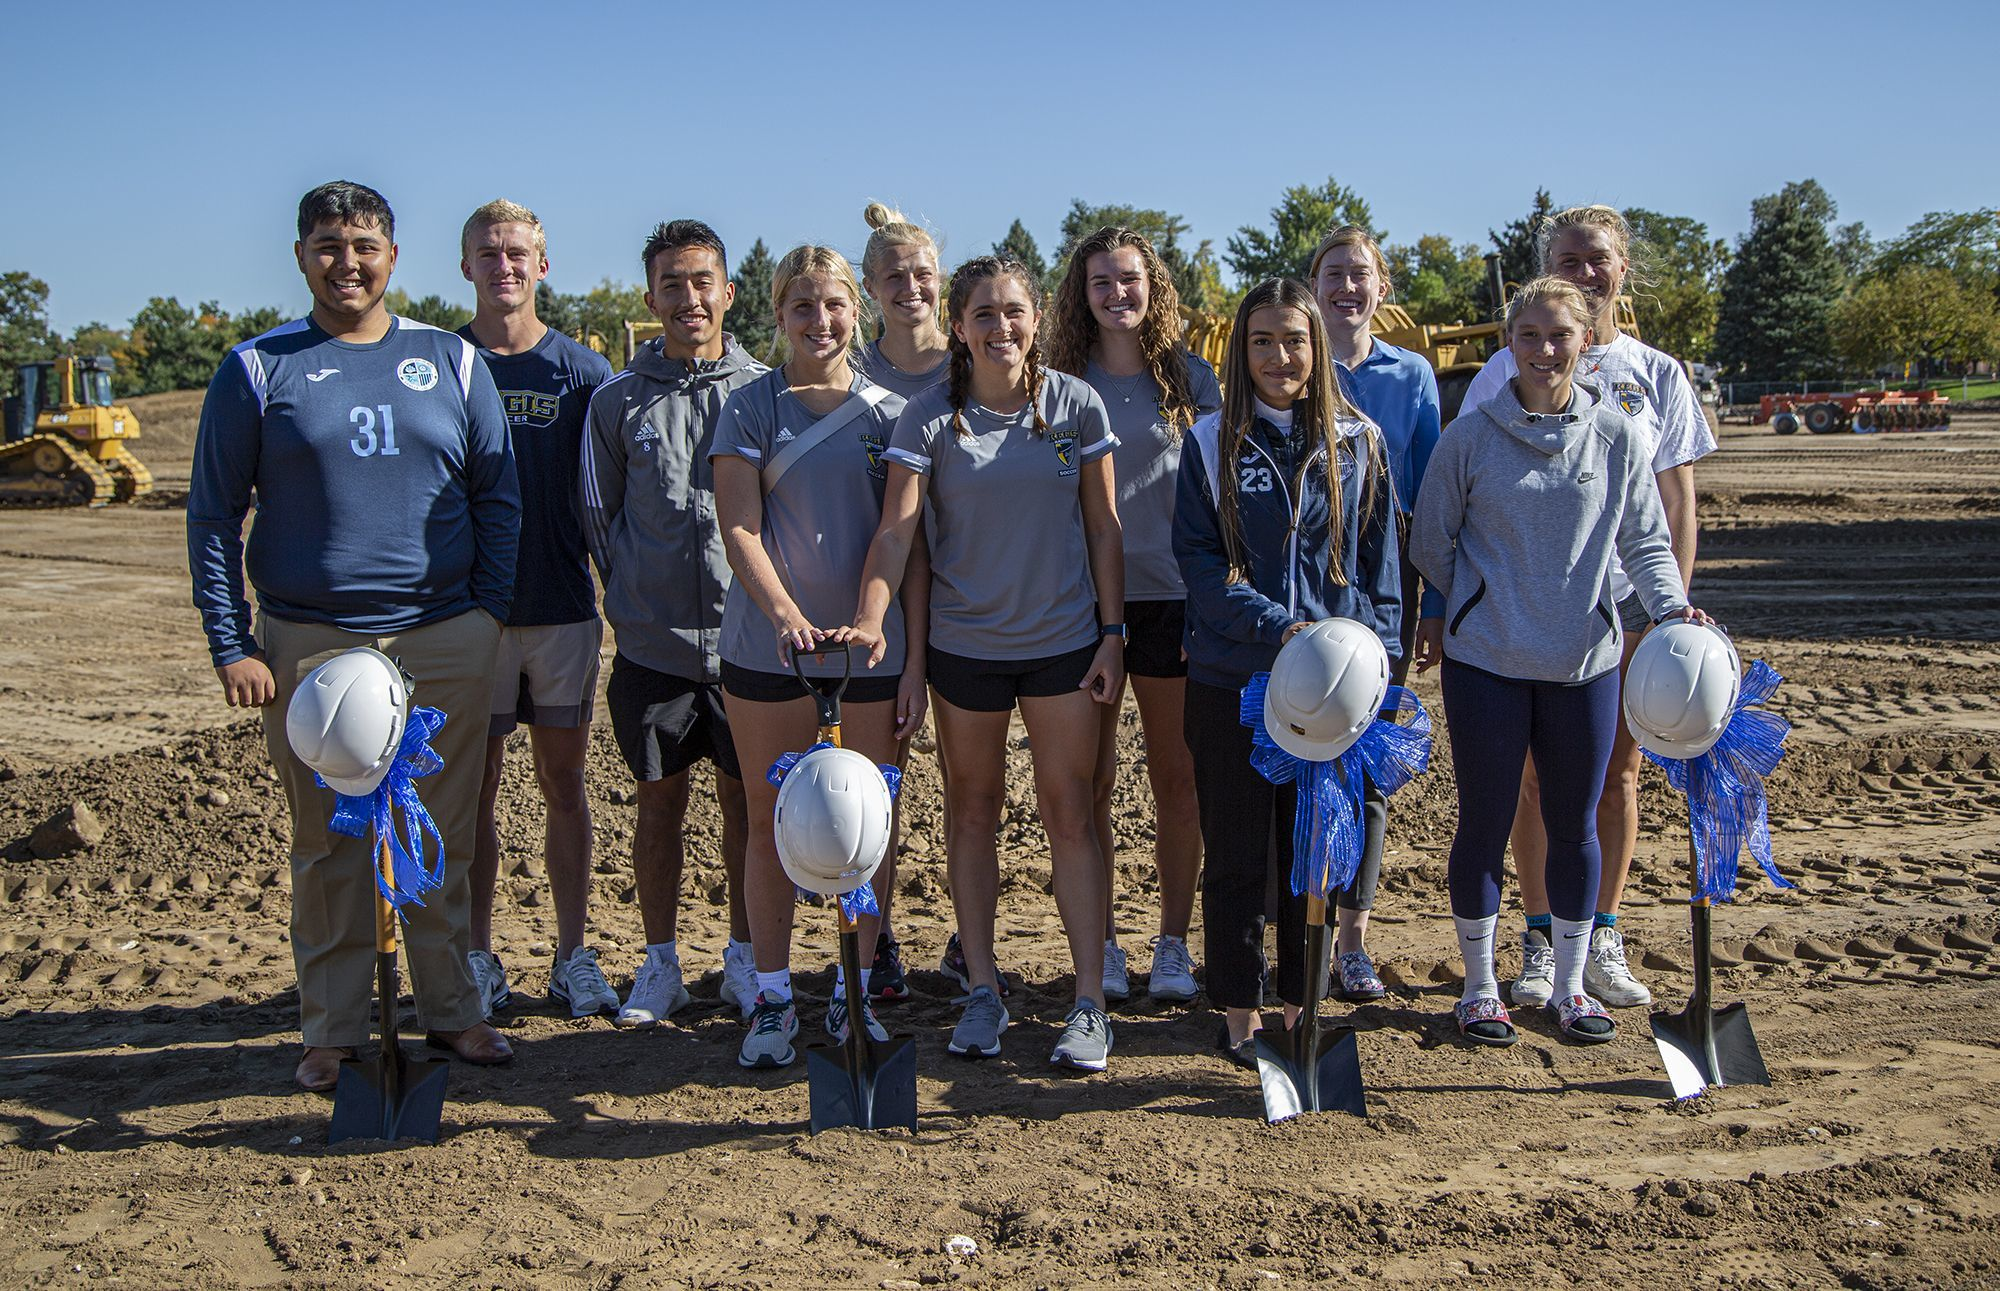 New fields will serve Regis University and Arrupe Jesuit High School athletes